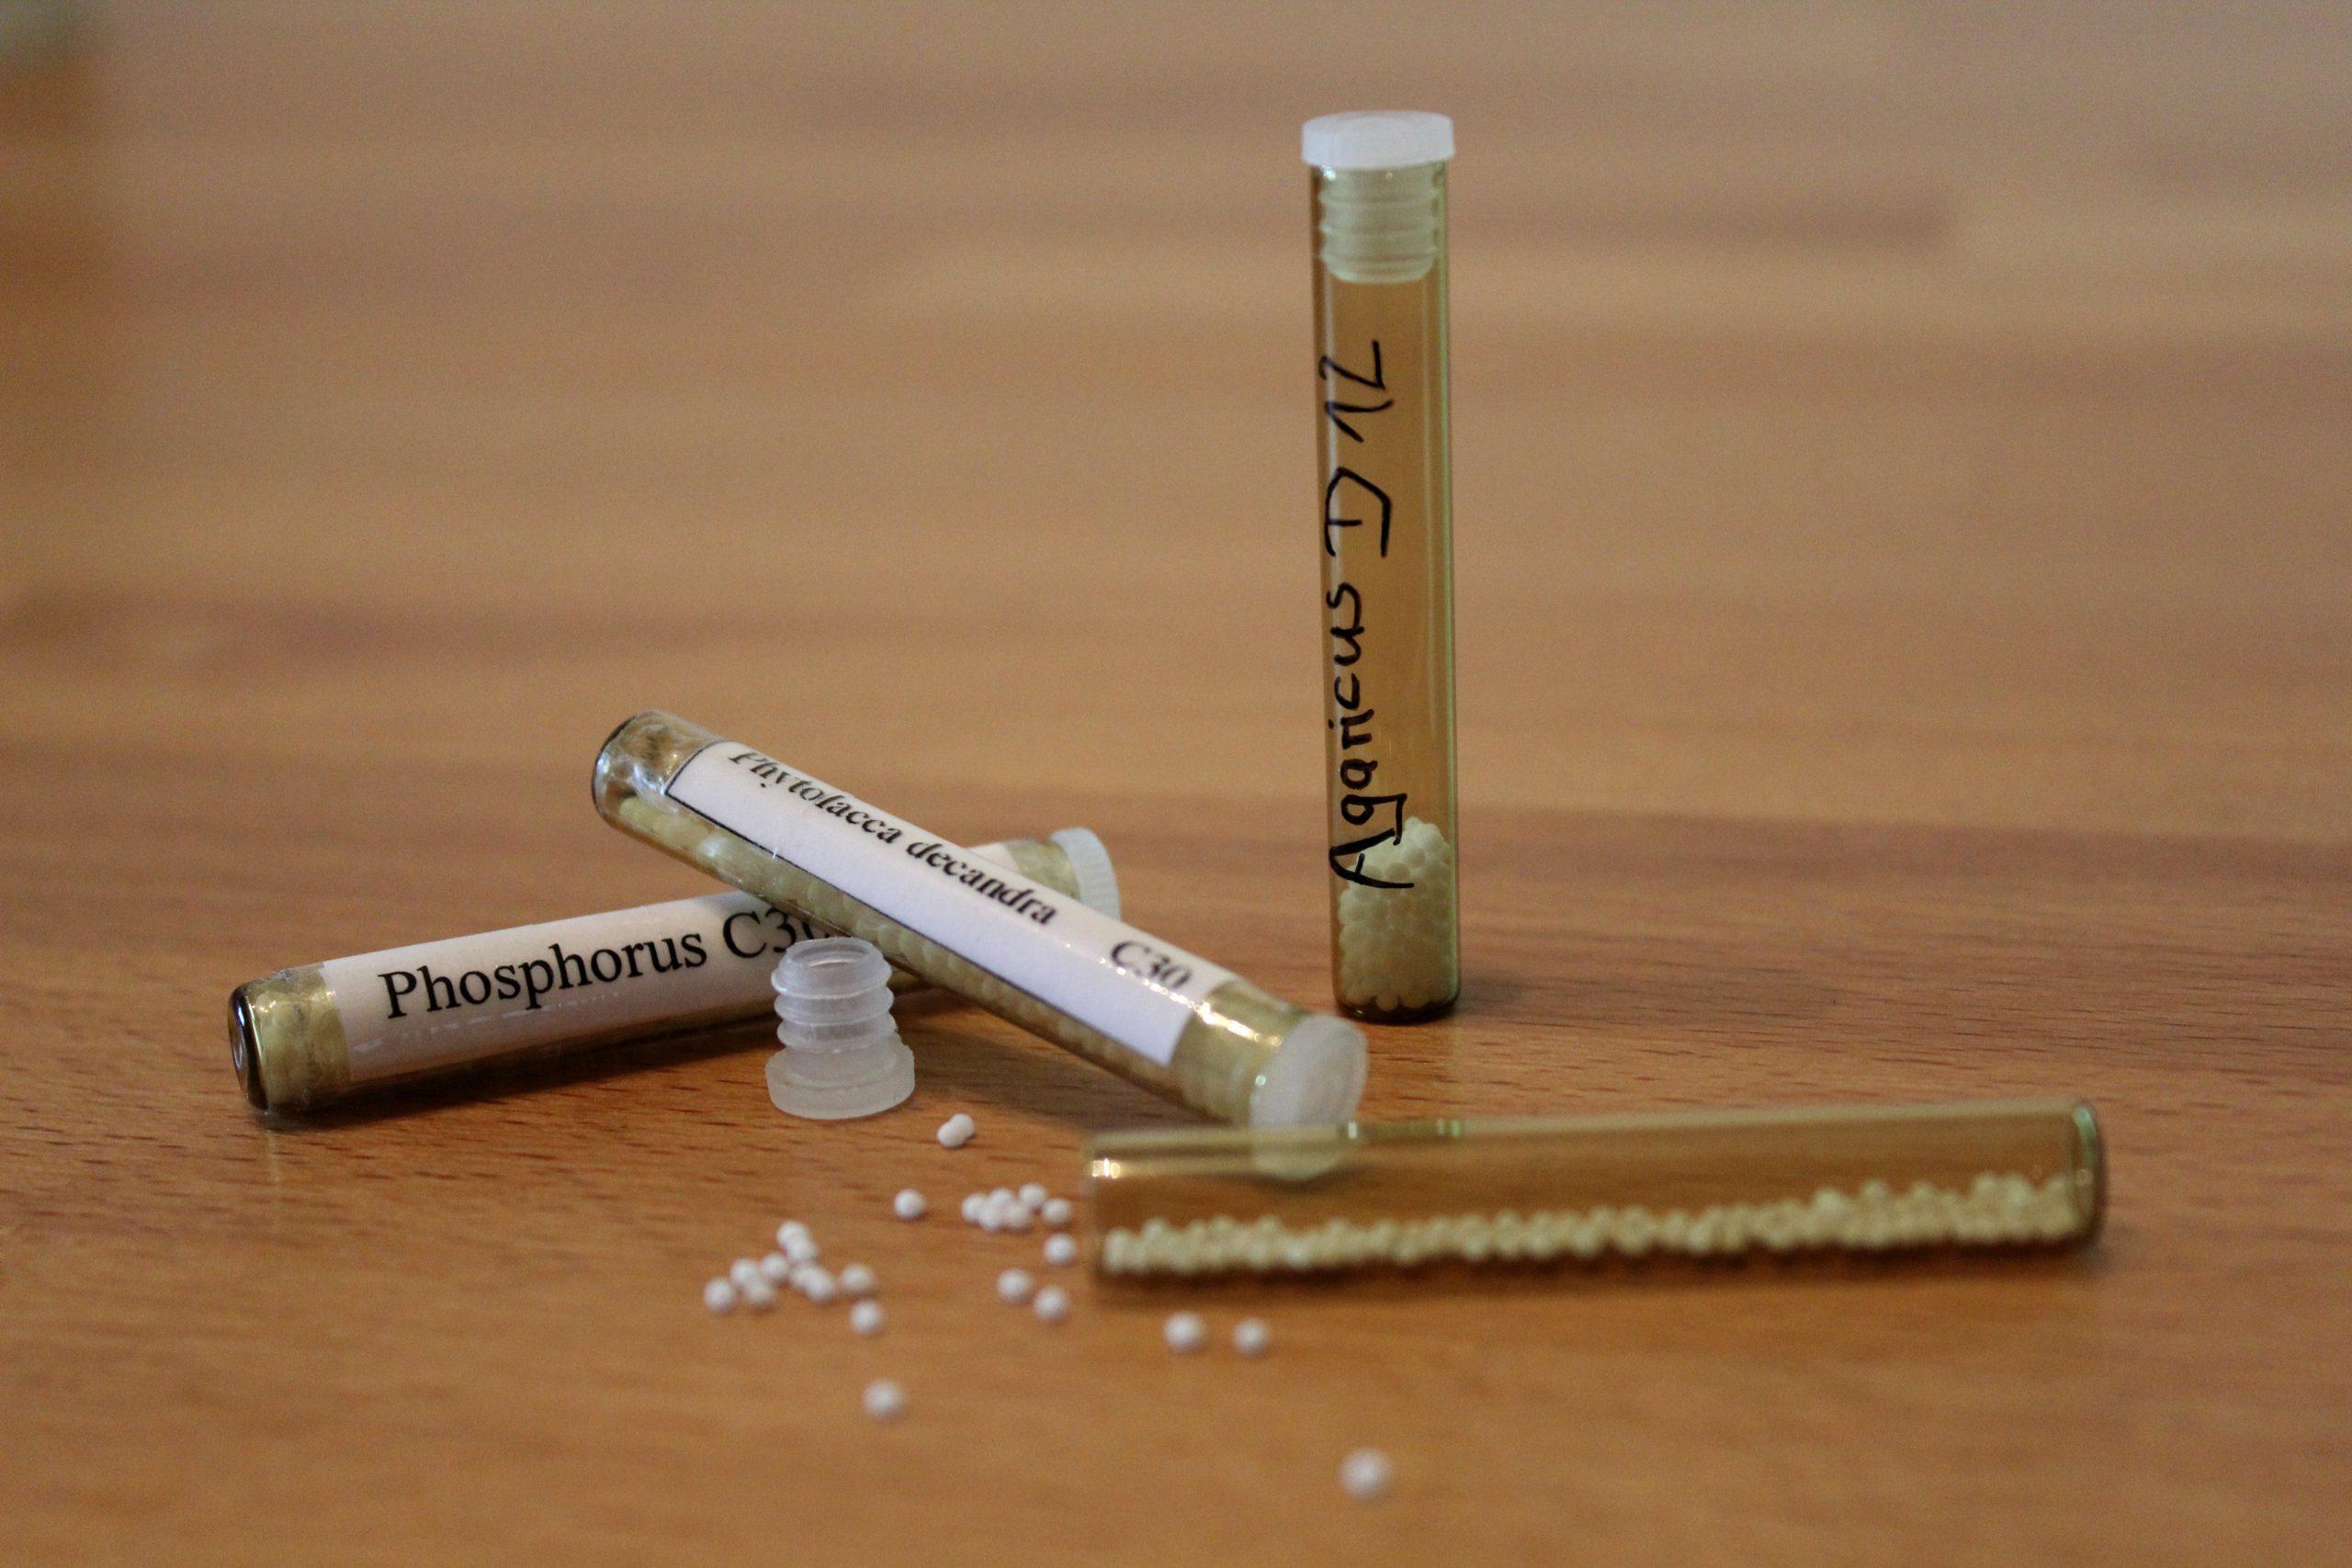 tube-glass-pen-medicine-product-beads-1200279-pxhere.com